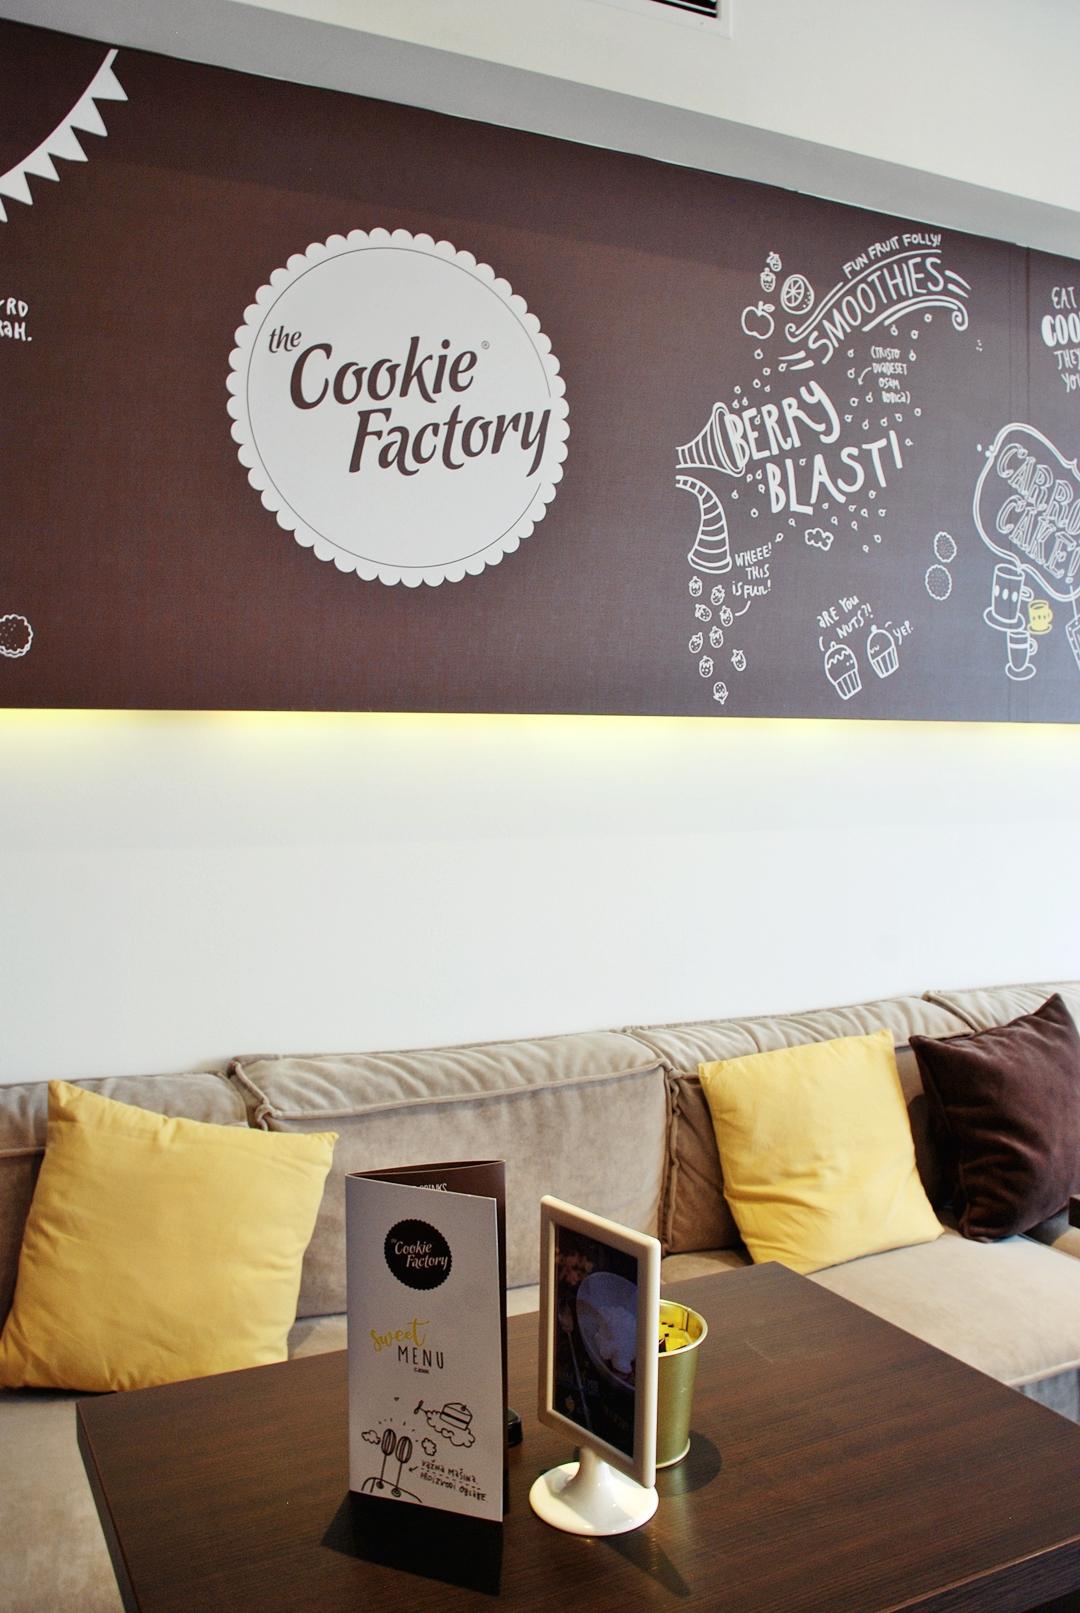 veliki crni cookie